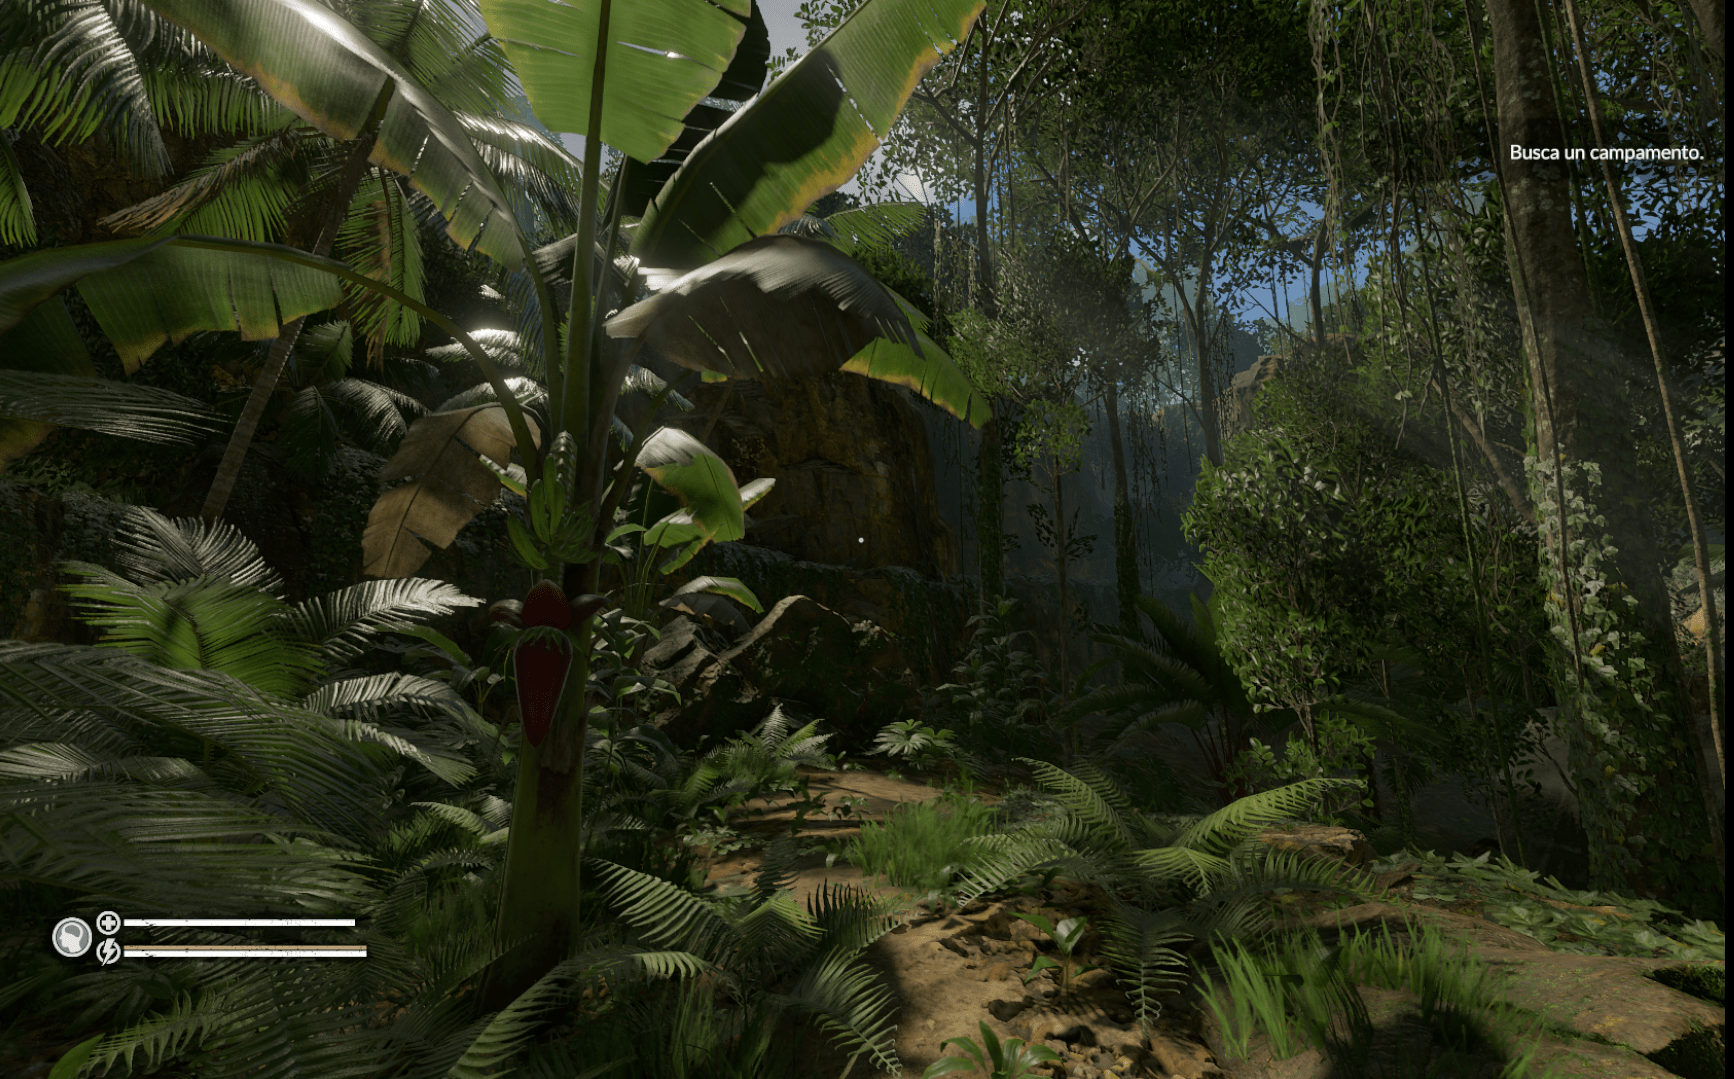 Green Hell Selva